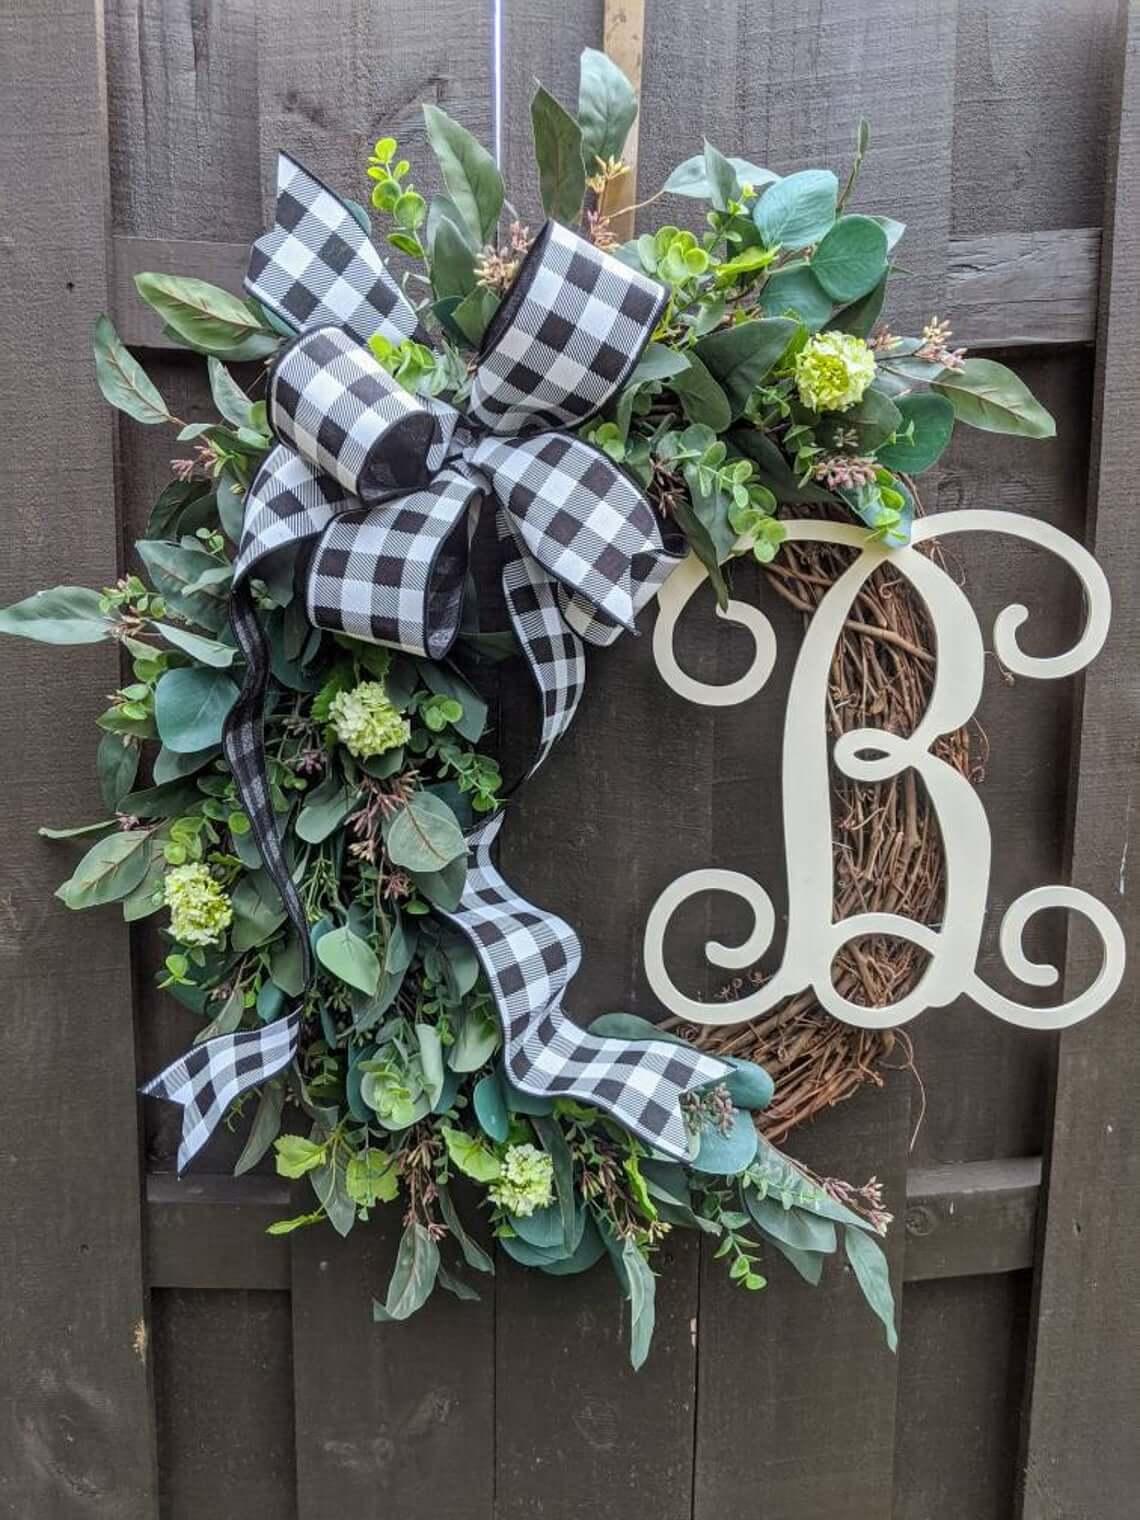 Grand Greenery and Grapevine Monogrammed Wreath